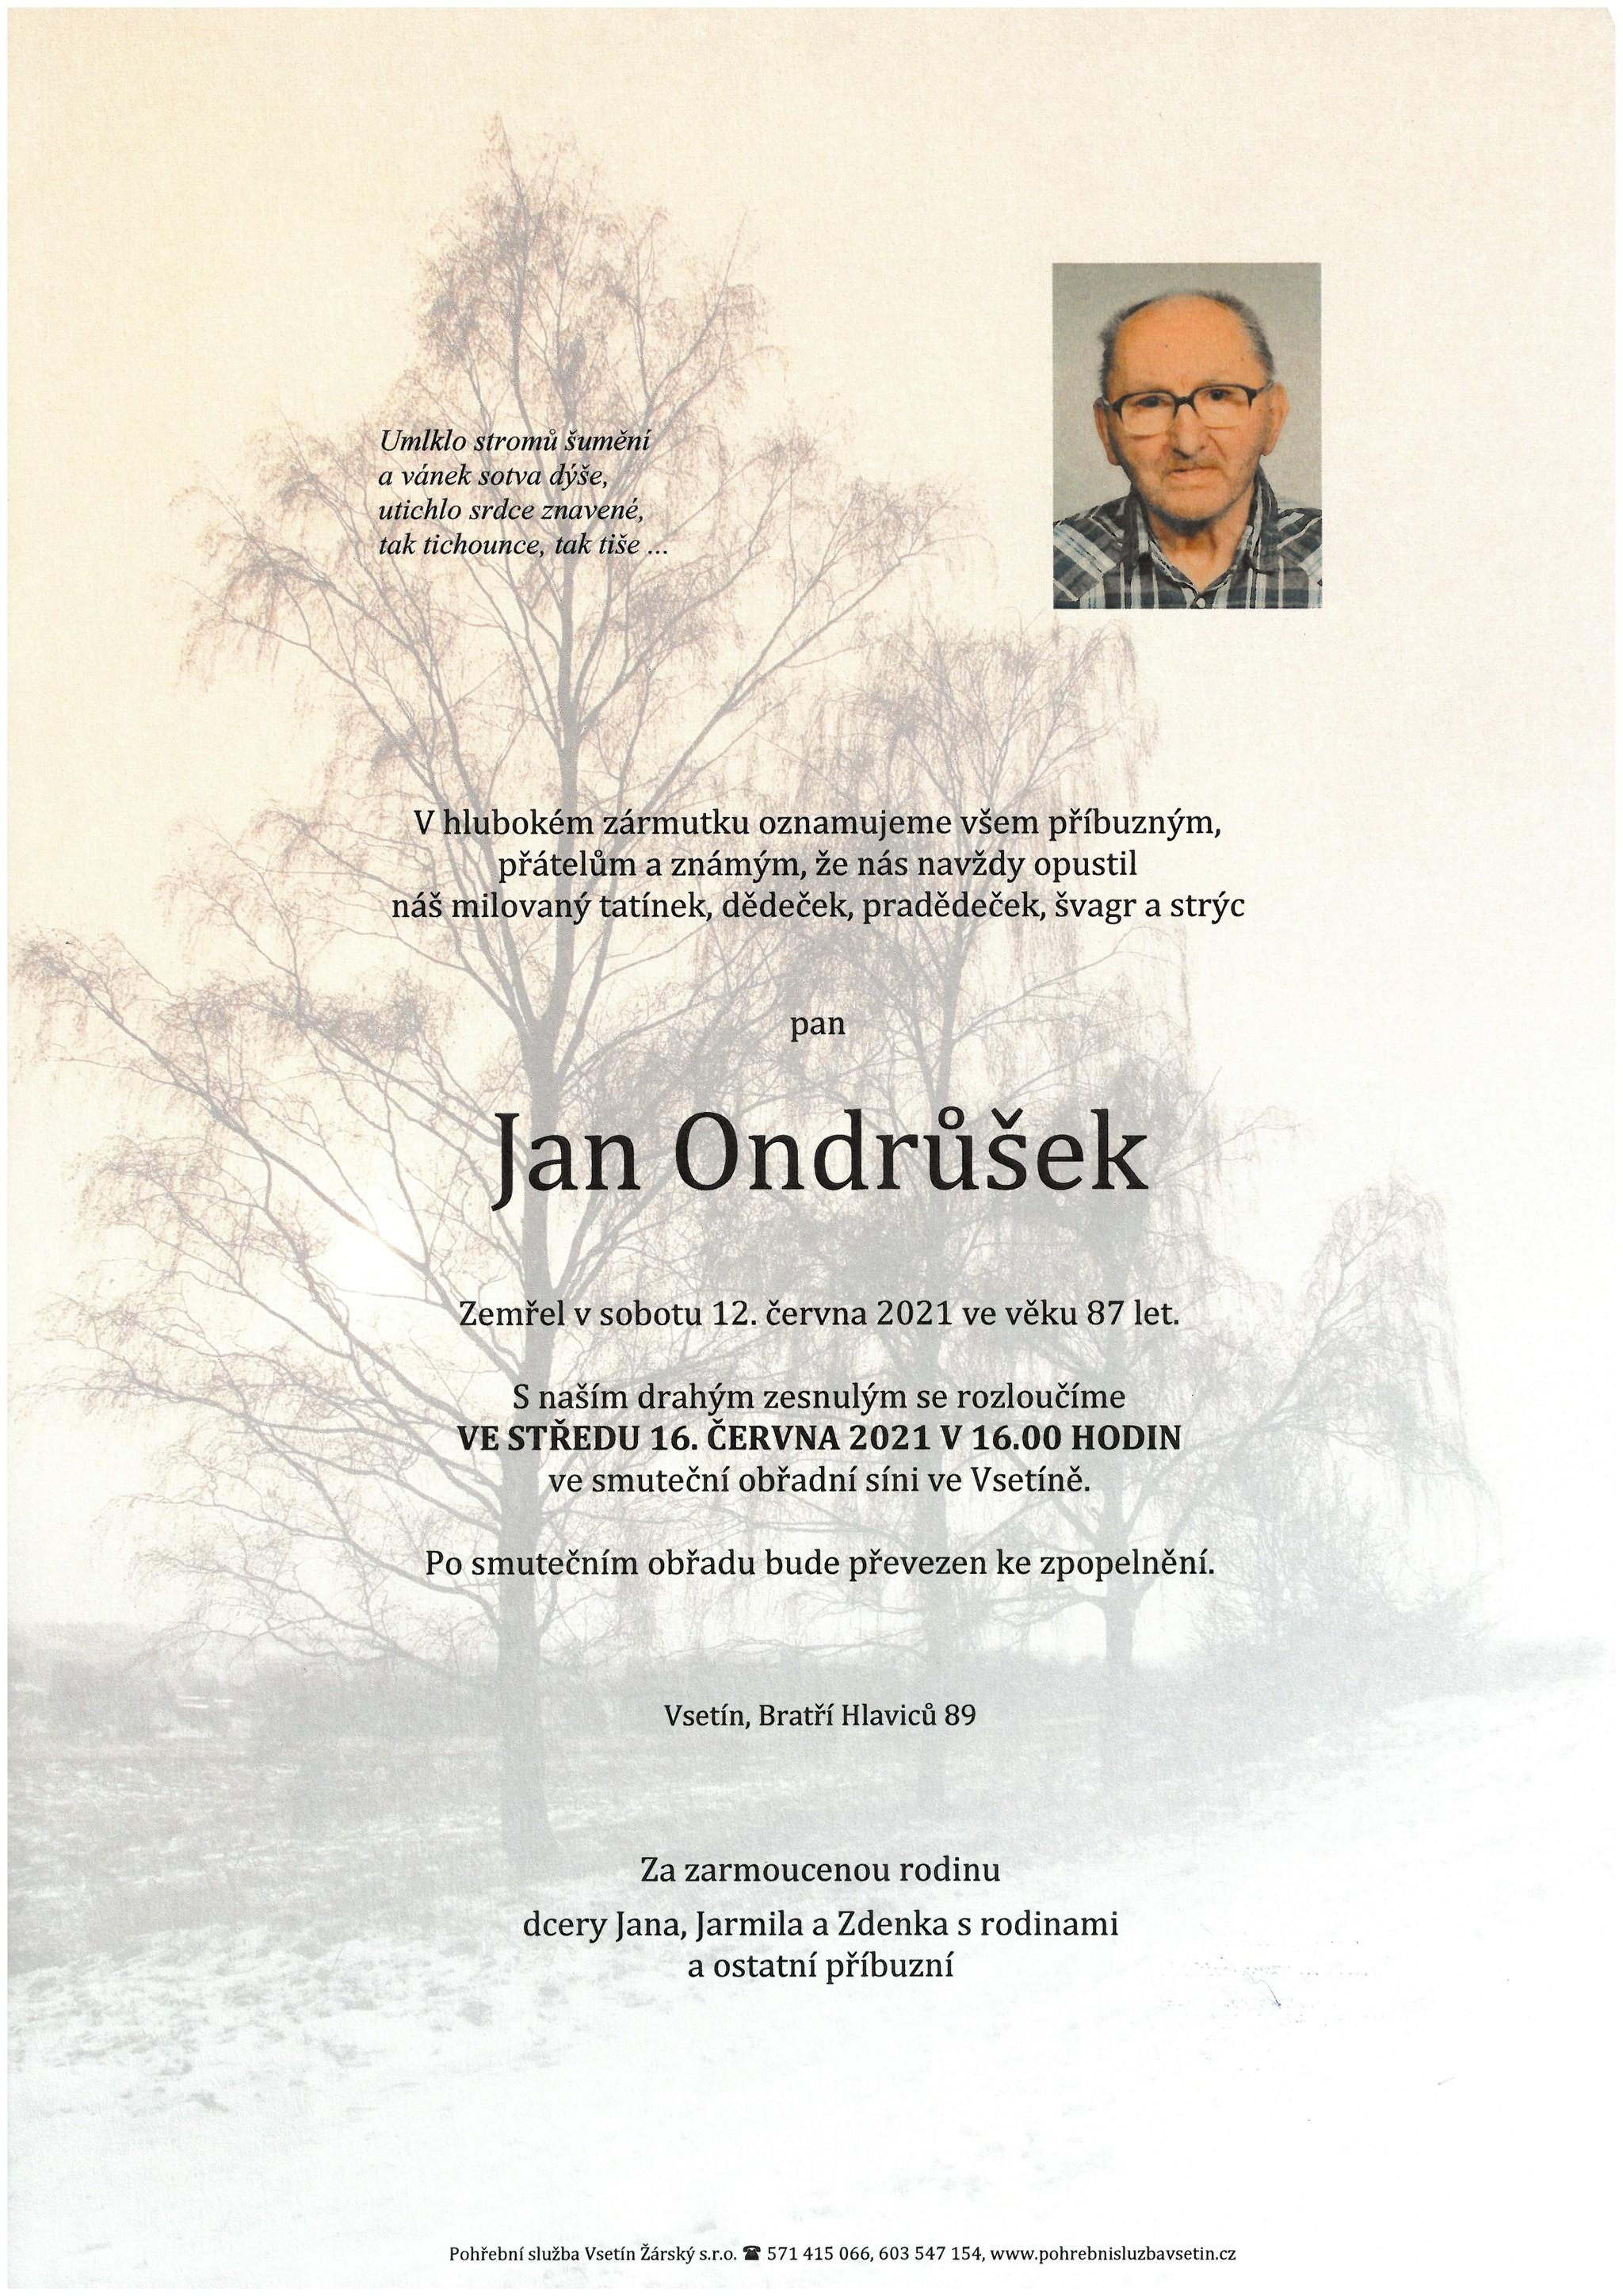 Jan Ondrůšek